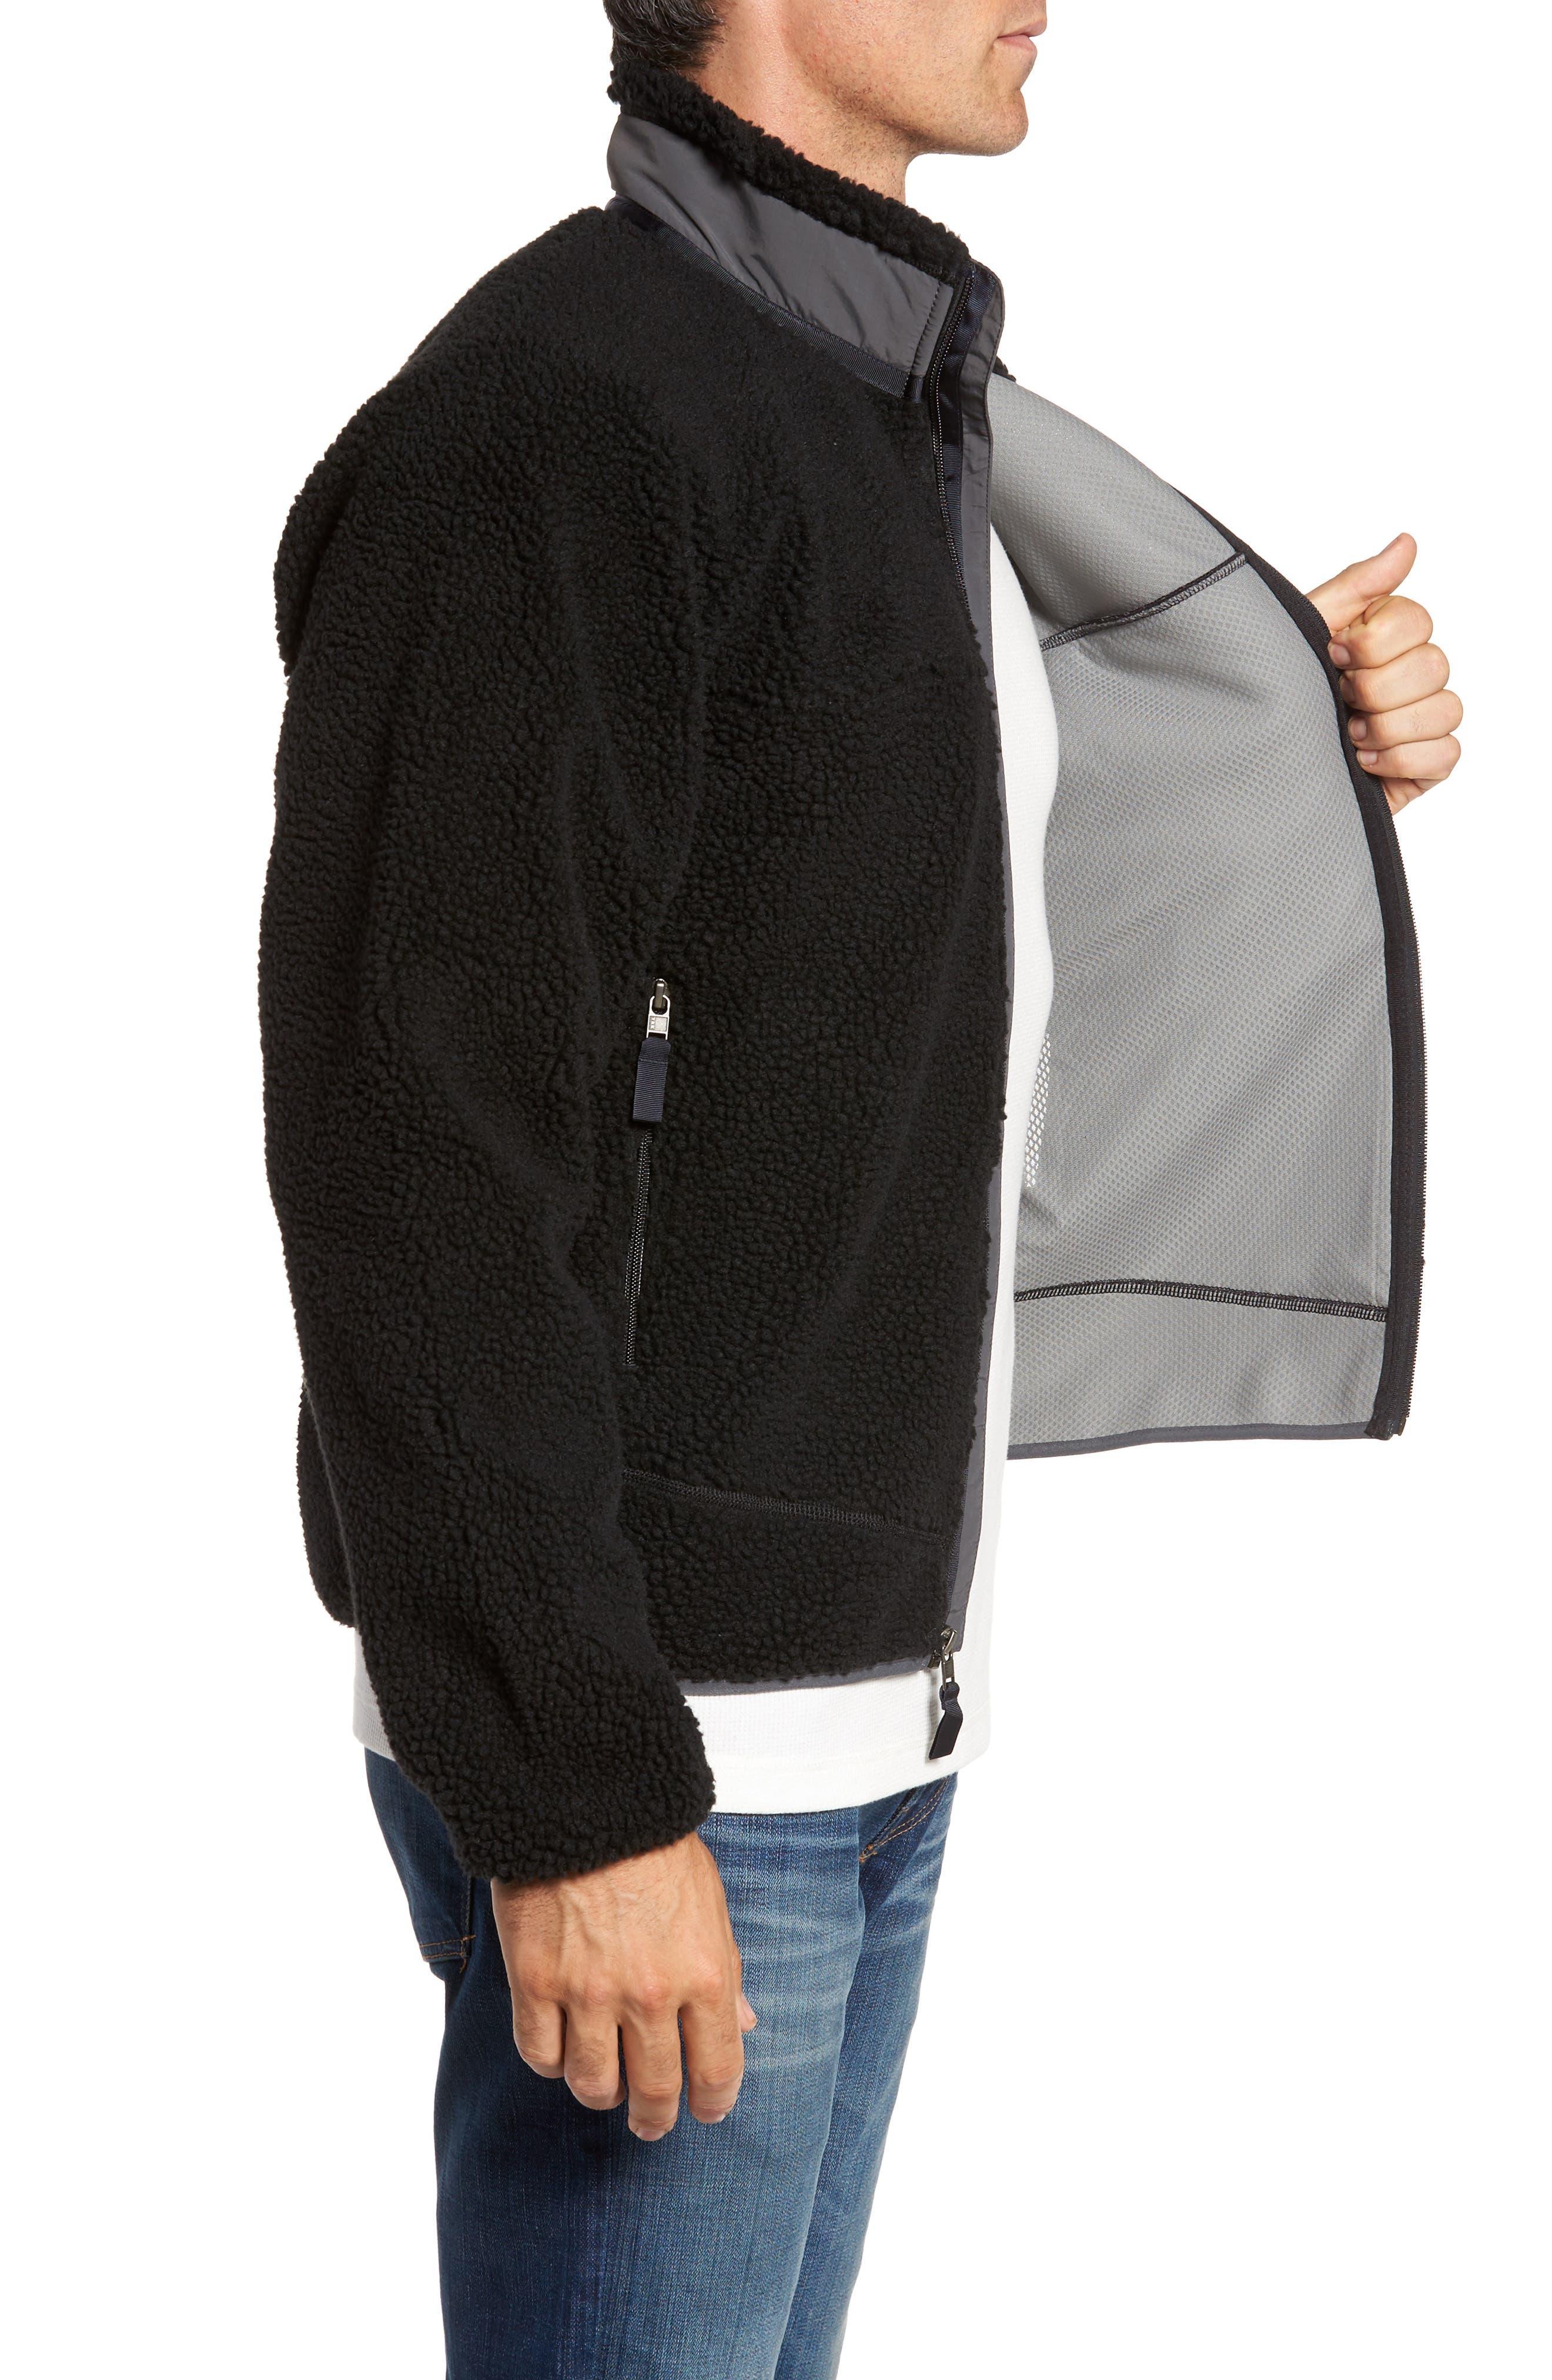 Retro-X Fleece Jacket,                             Alternate thumbnail 3, color,                             002